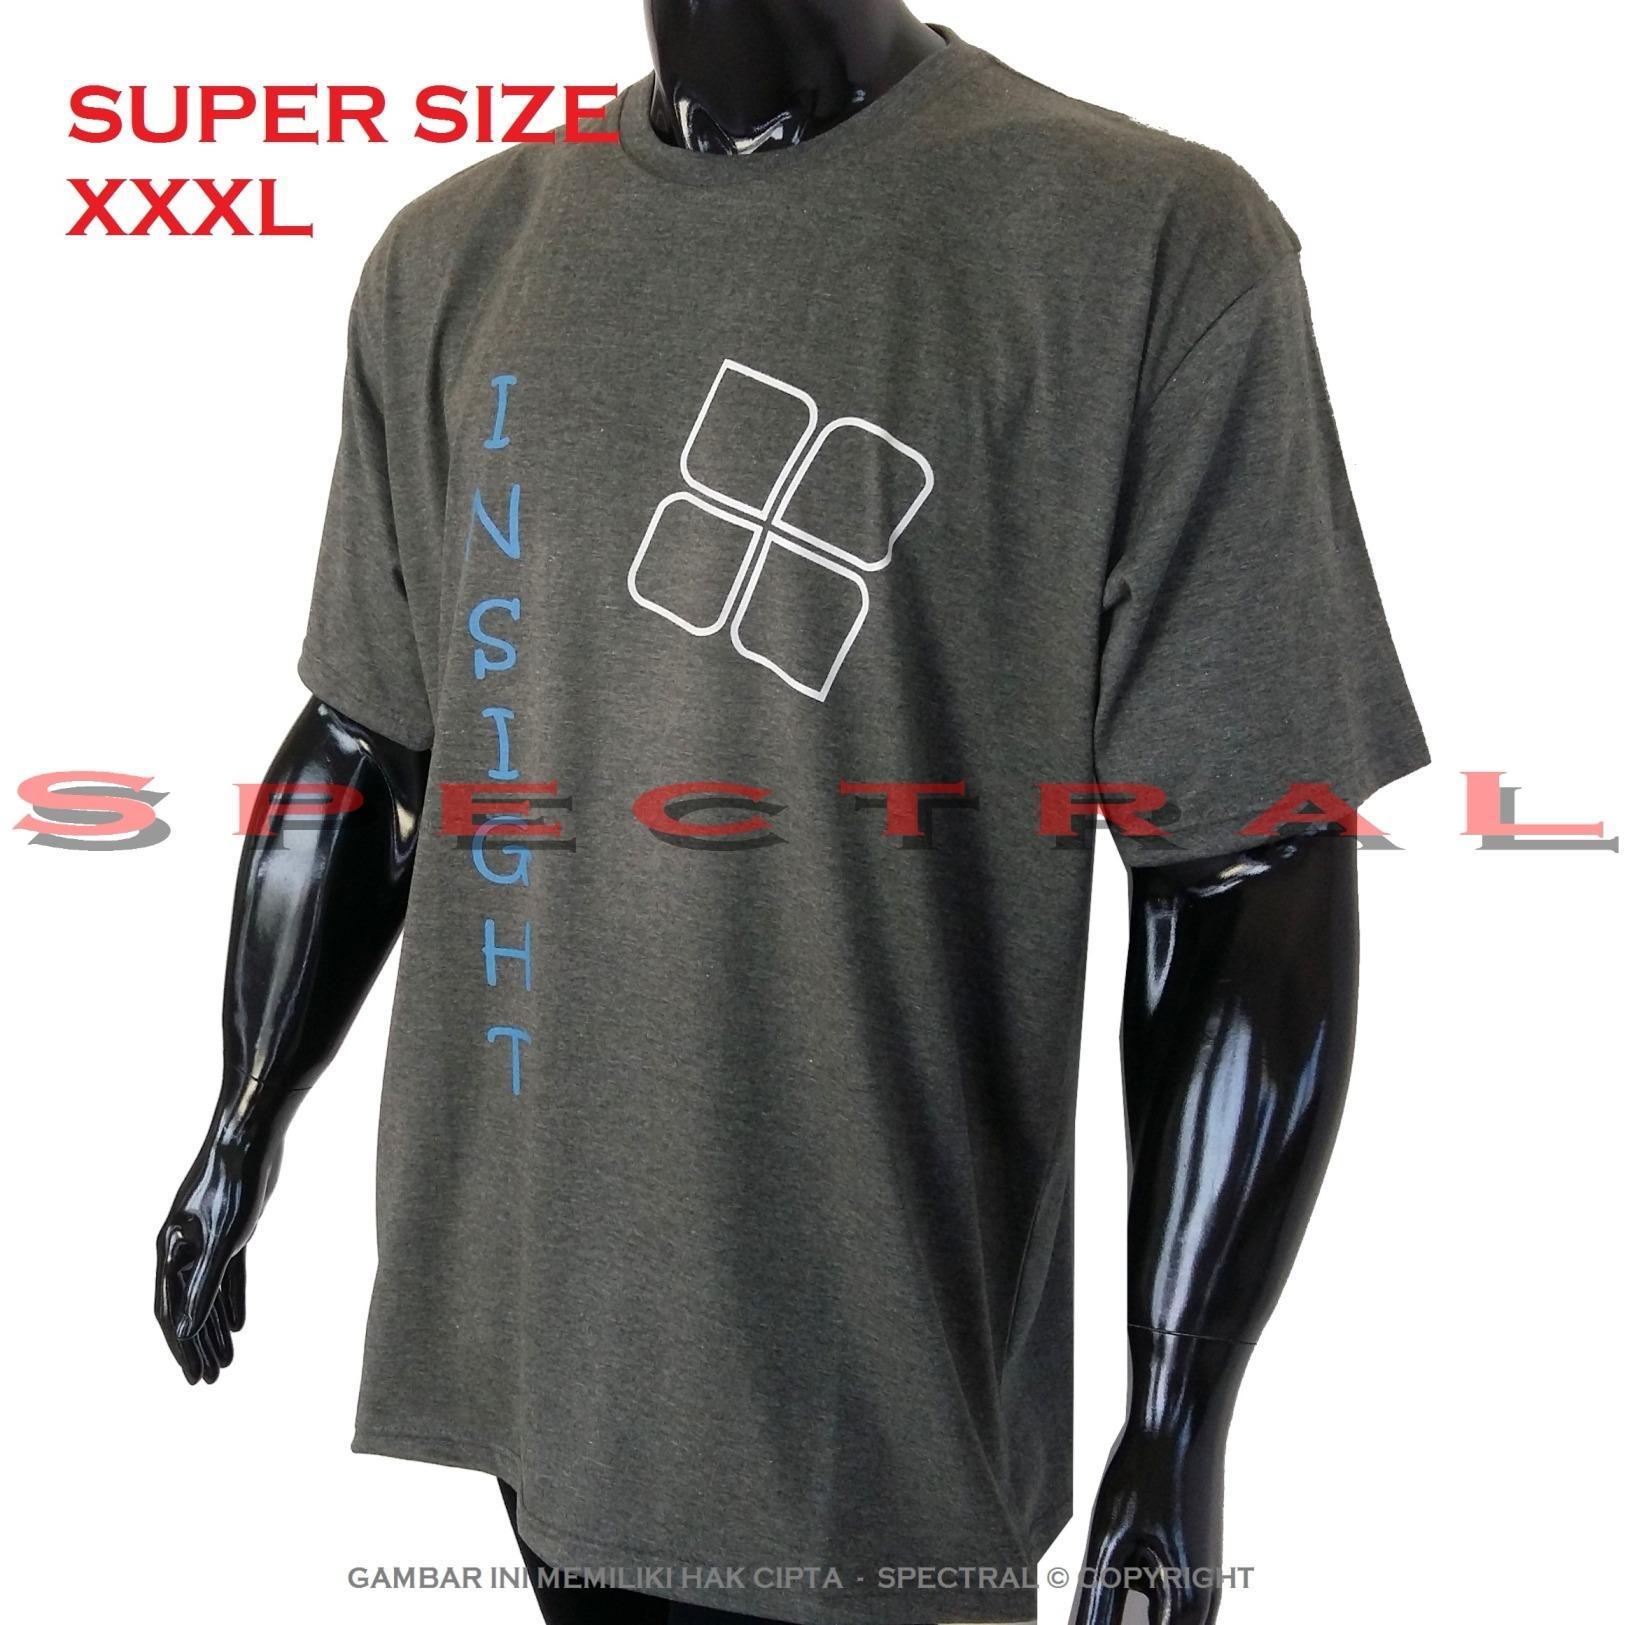 Spectral – 3XL SUPER BIG SIZE XXXL 100% Cotton Combed Kaos Distro Jumbo BIGSIZE T-Shirt Fashion Ukuran Besar Polos Celana Atasan Pria Wanita Katun Bapak Orang Tua Gemuk Gendut Simple Sport Casual Halus Baju Cowo Cewe Pakaian Super Size 3L INSIGHT 4 ABUTUA